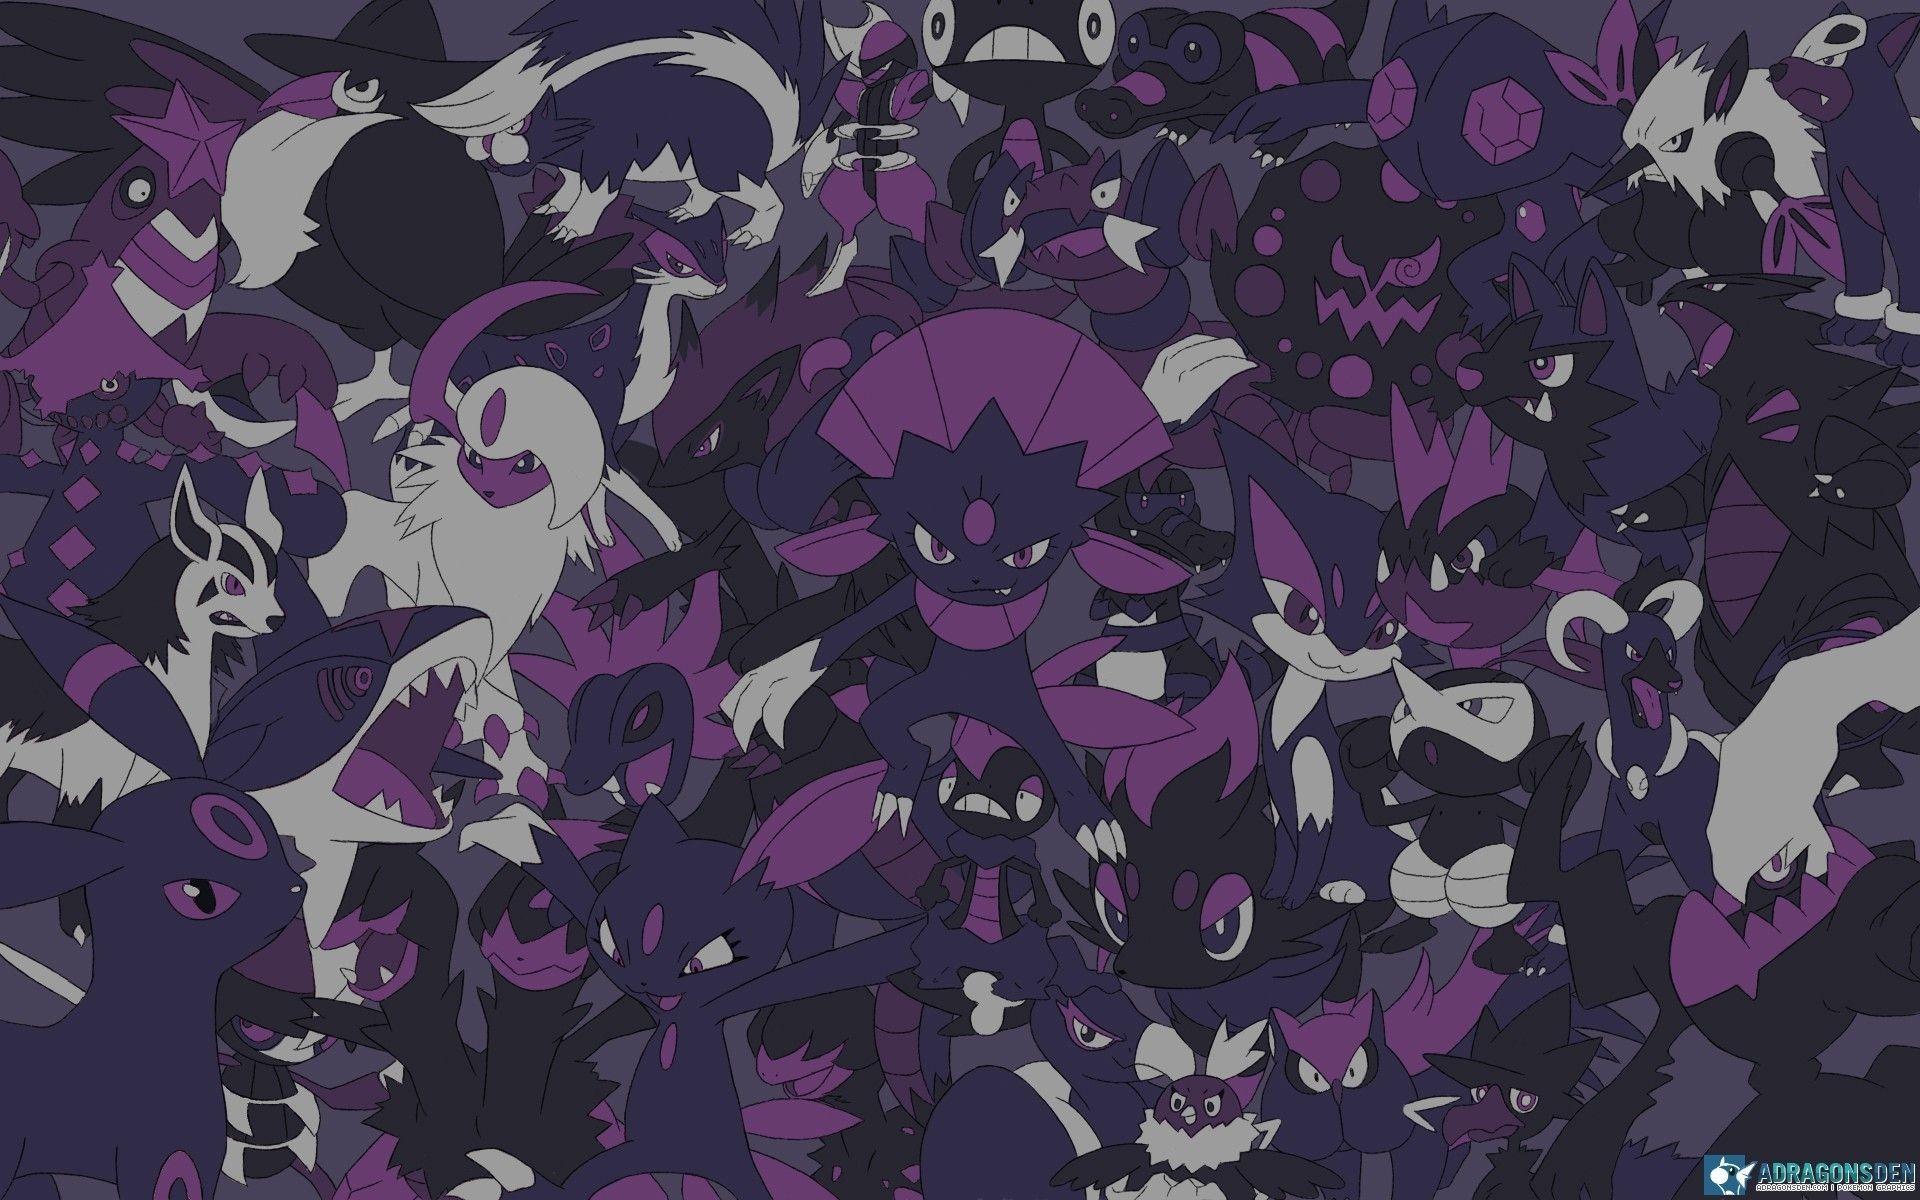 Dark type wallpaper pok mon ghost pokemon dark type pokemon type pokemon - Pokemon ghost wallpaper ...